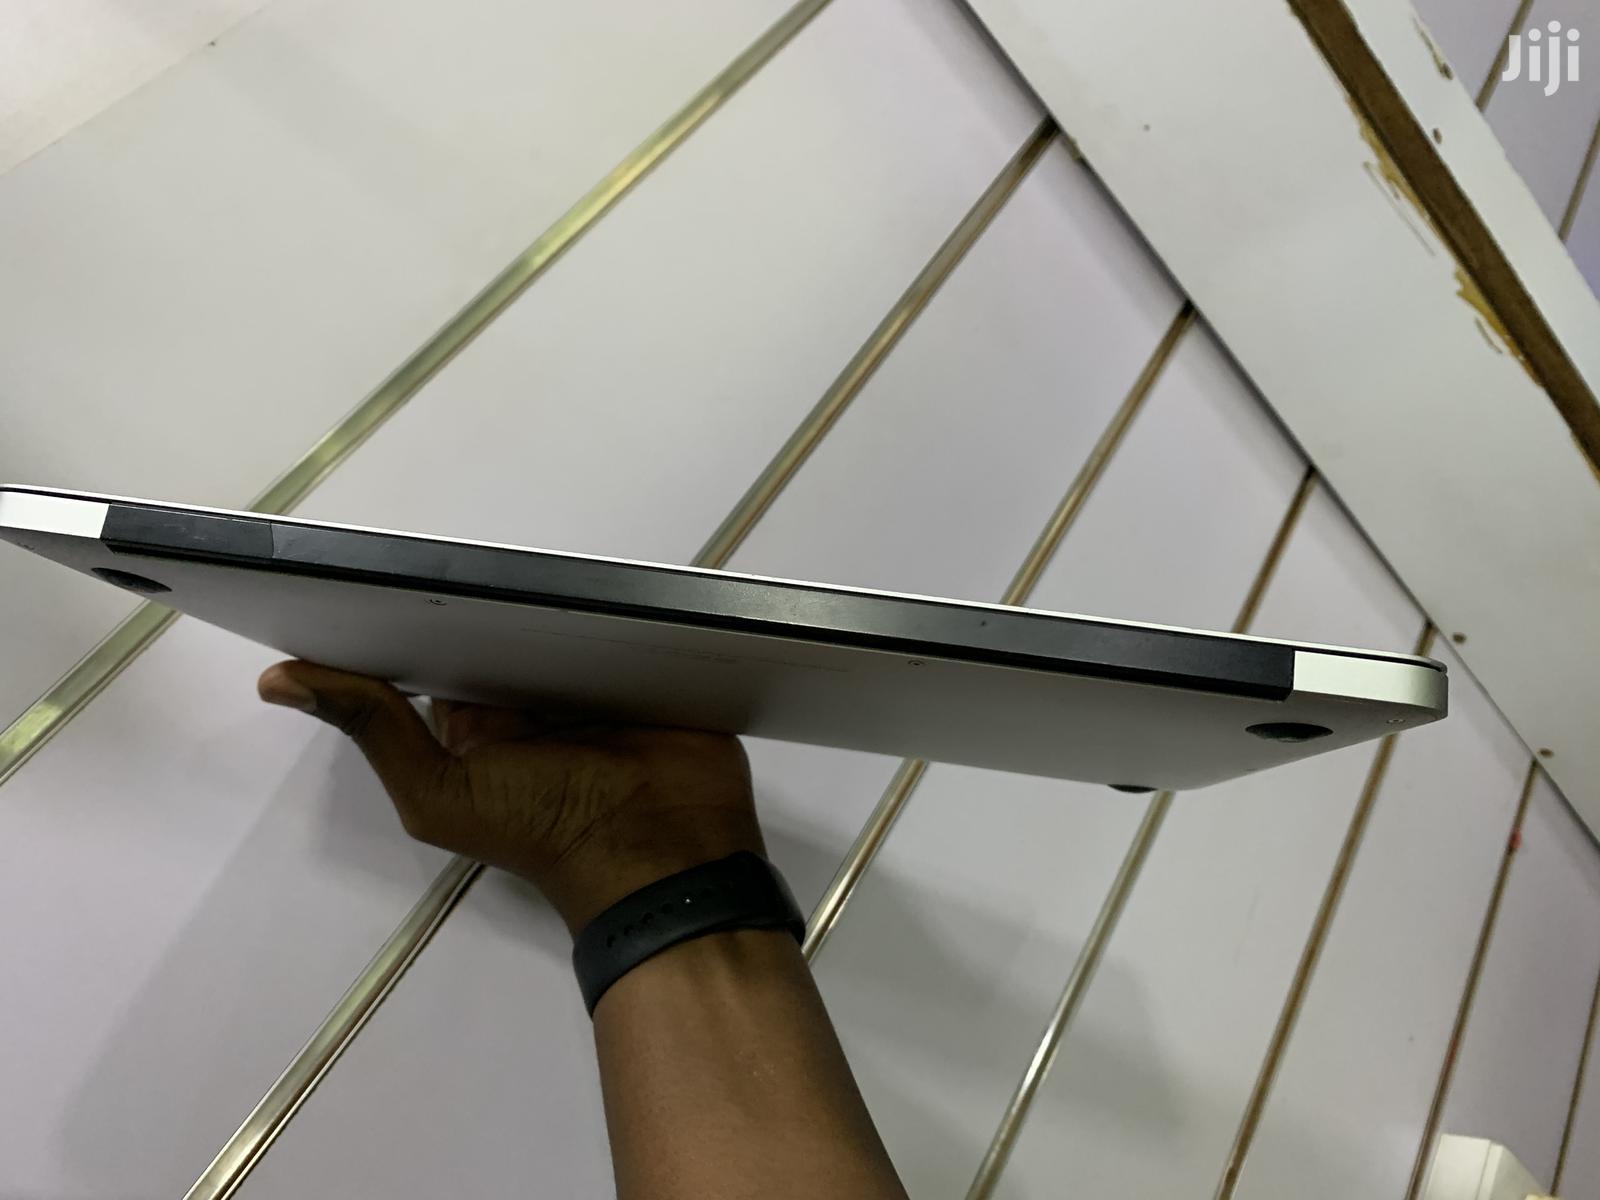 Laptop Apple MacBook Air 8GB Intel Core i5 SSD 128GB | Laptops & Computers for sale in Kampala, Central Region, Uganda